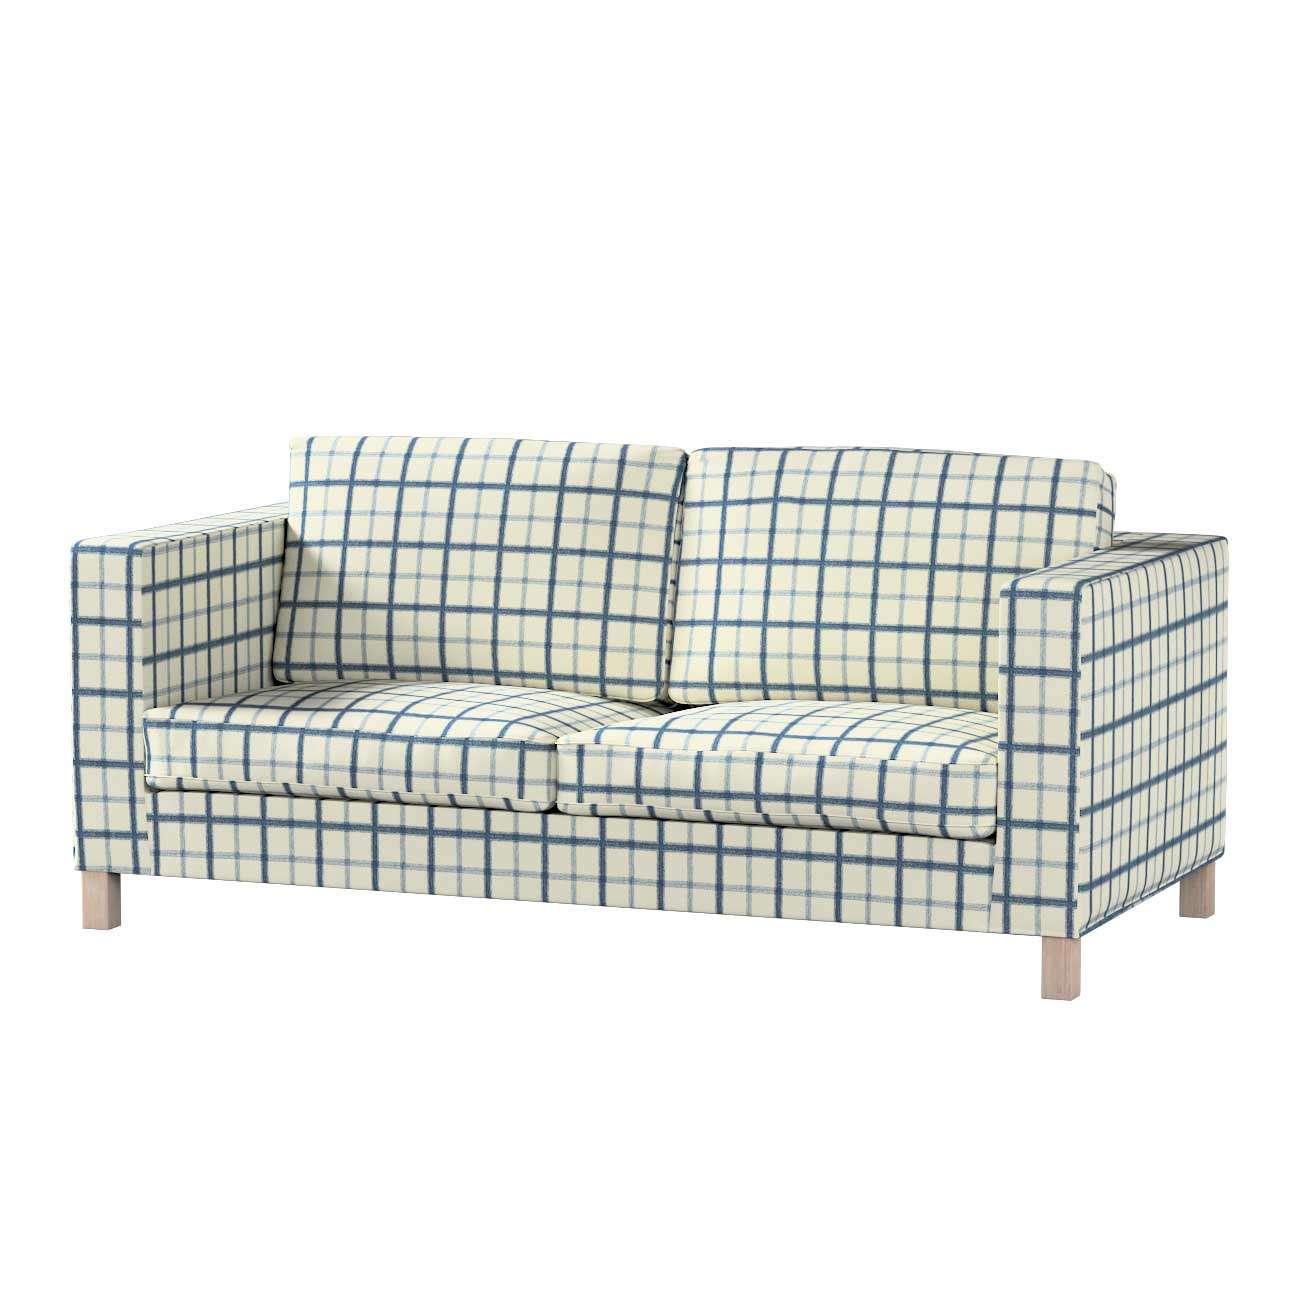 Potah na pohovku IKEA  Karlanda rozkládací, krátký pohovka Karlanda rozkládací v kolekci Avignon, látka: 131-66